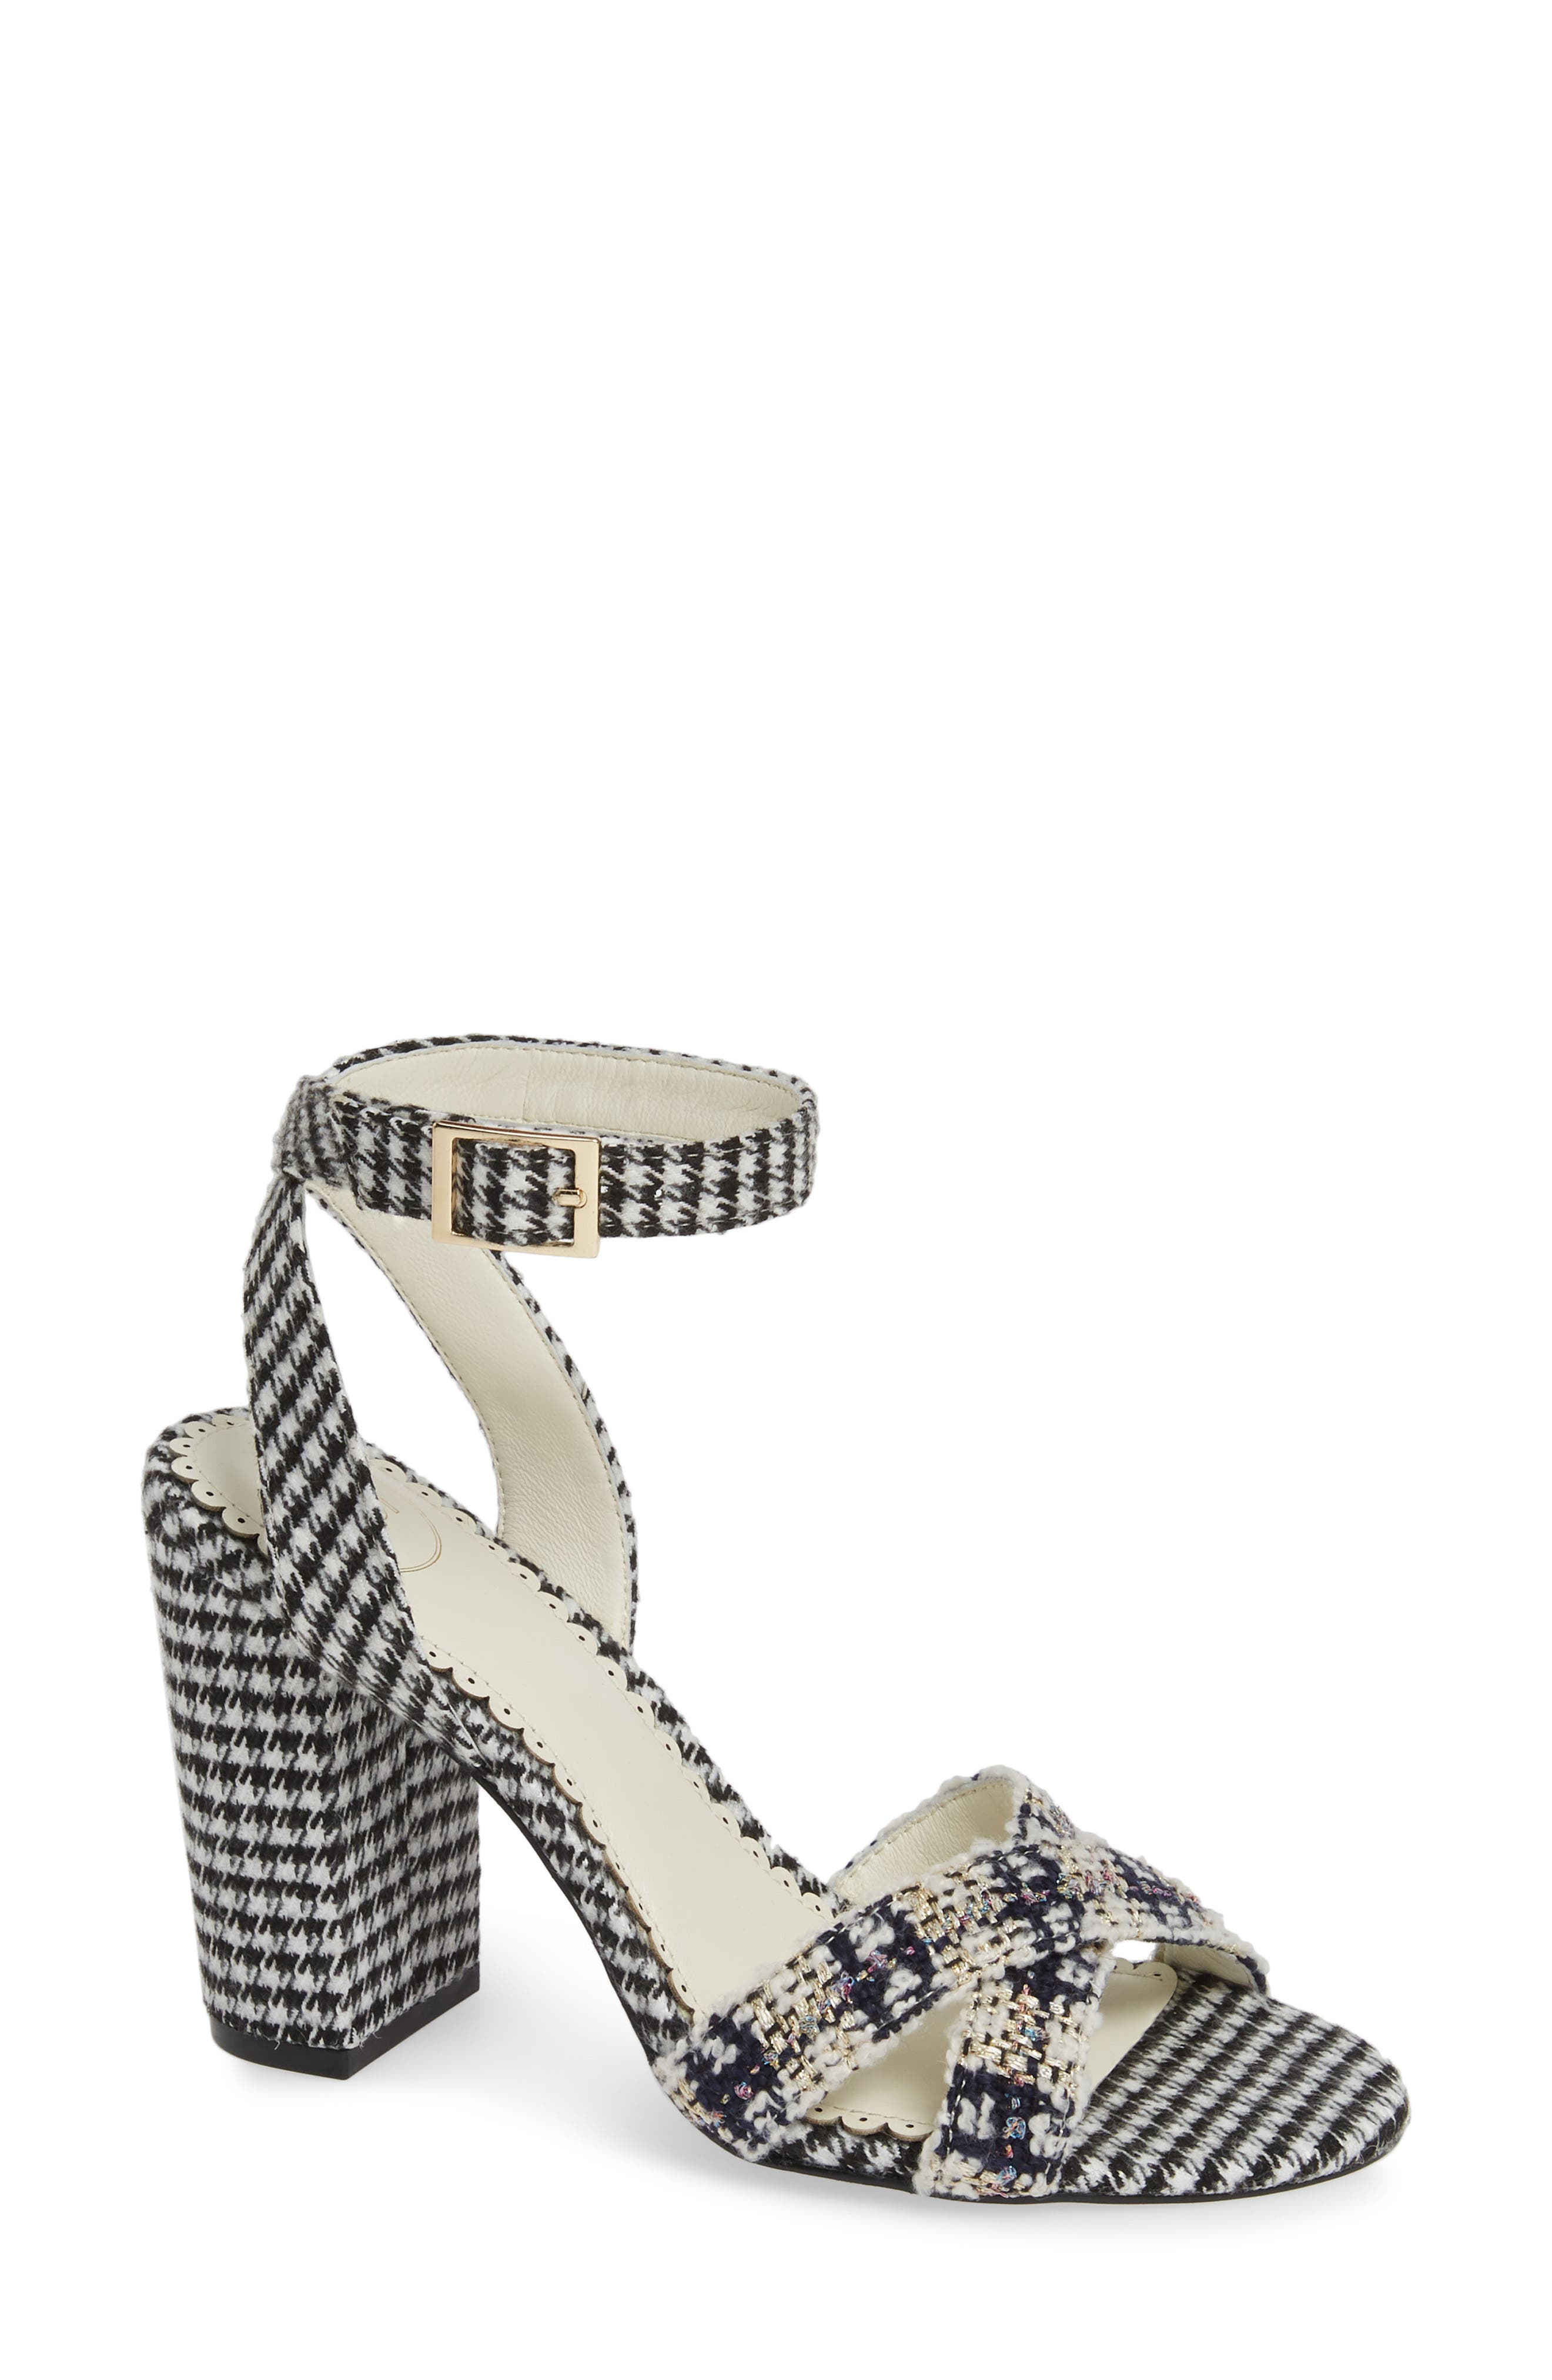 88f8151682c Women s 1901 Shoes